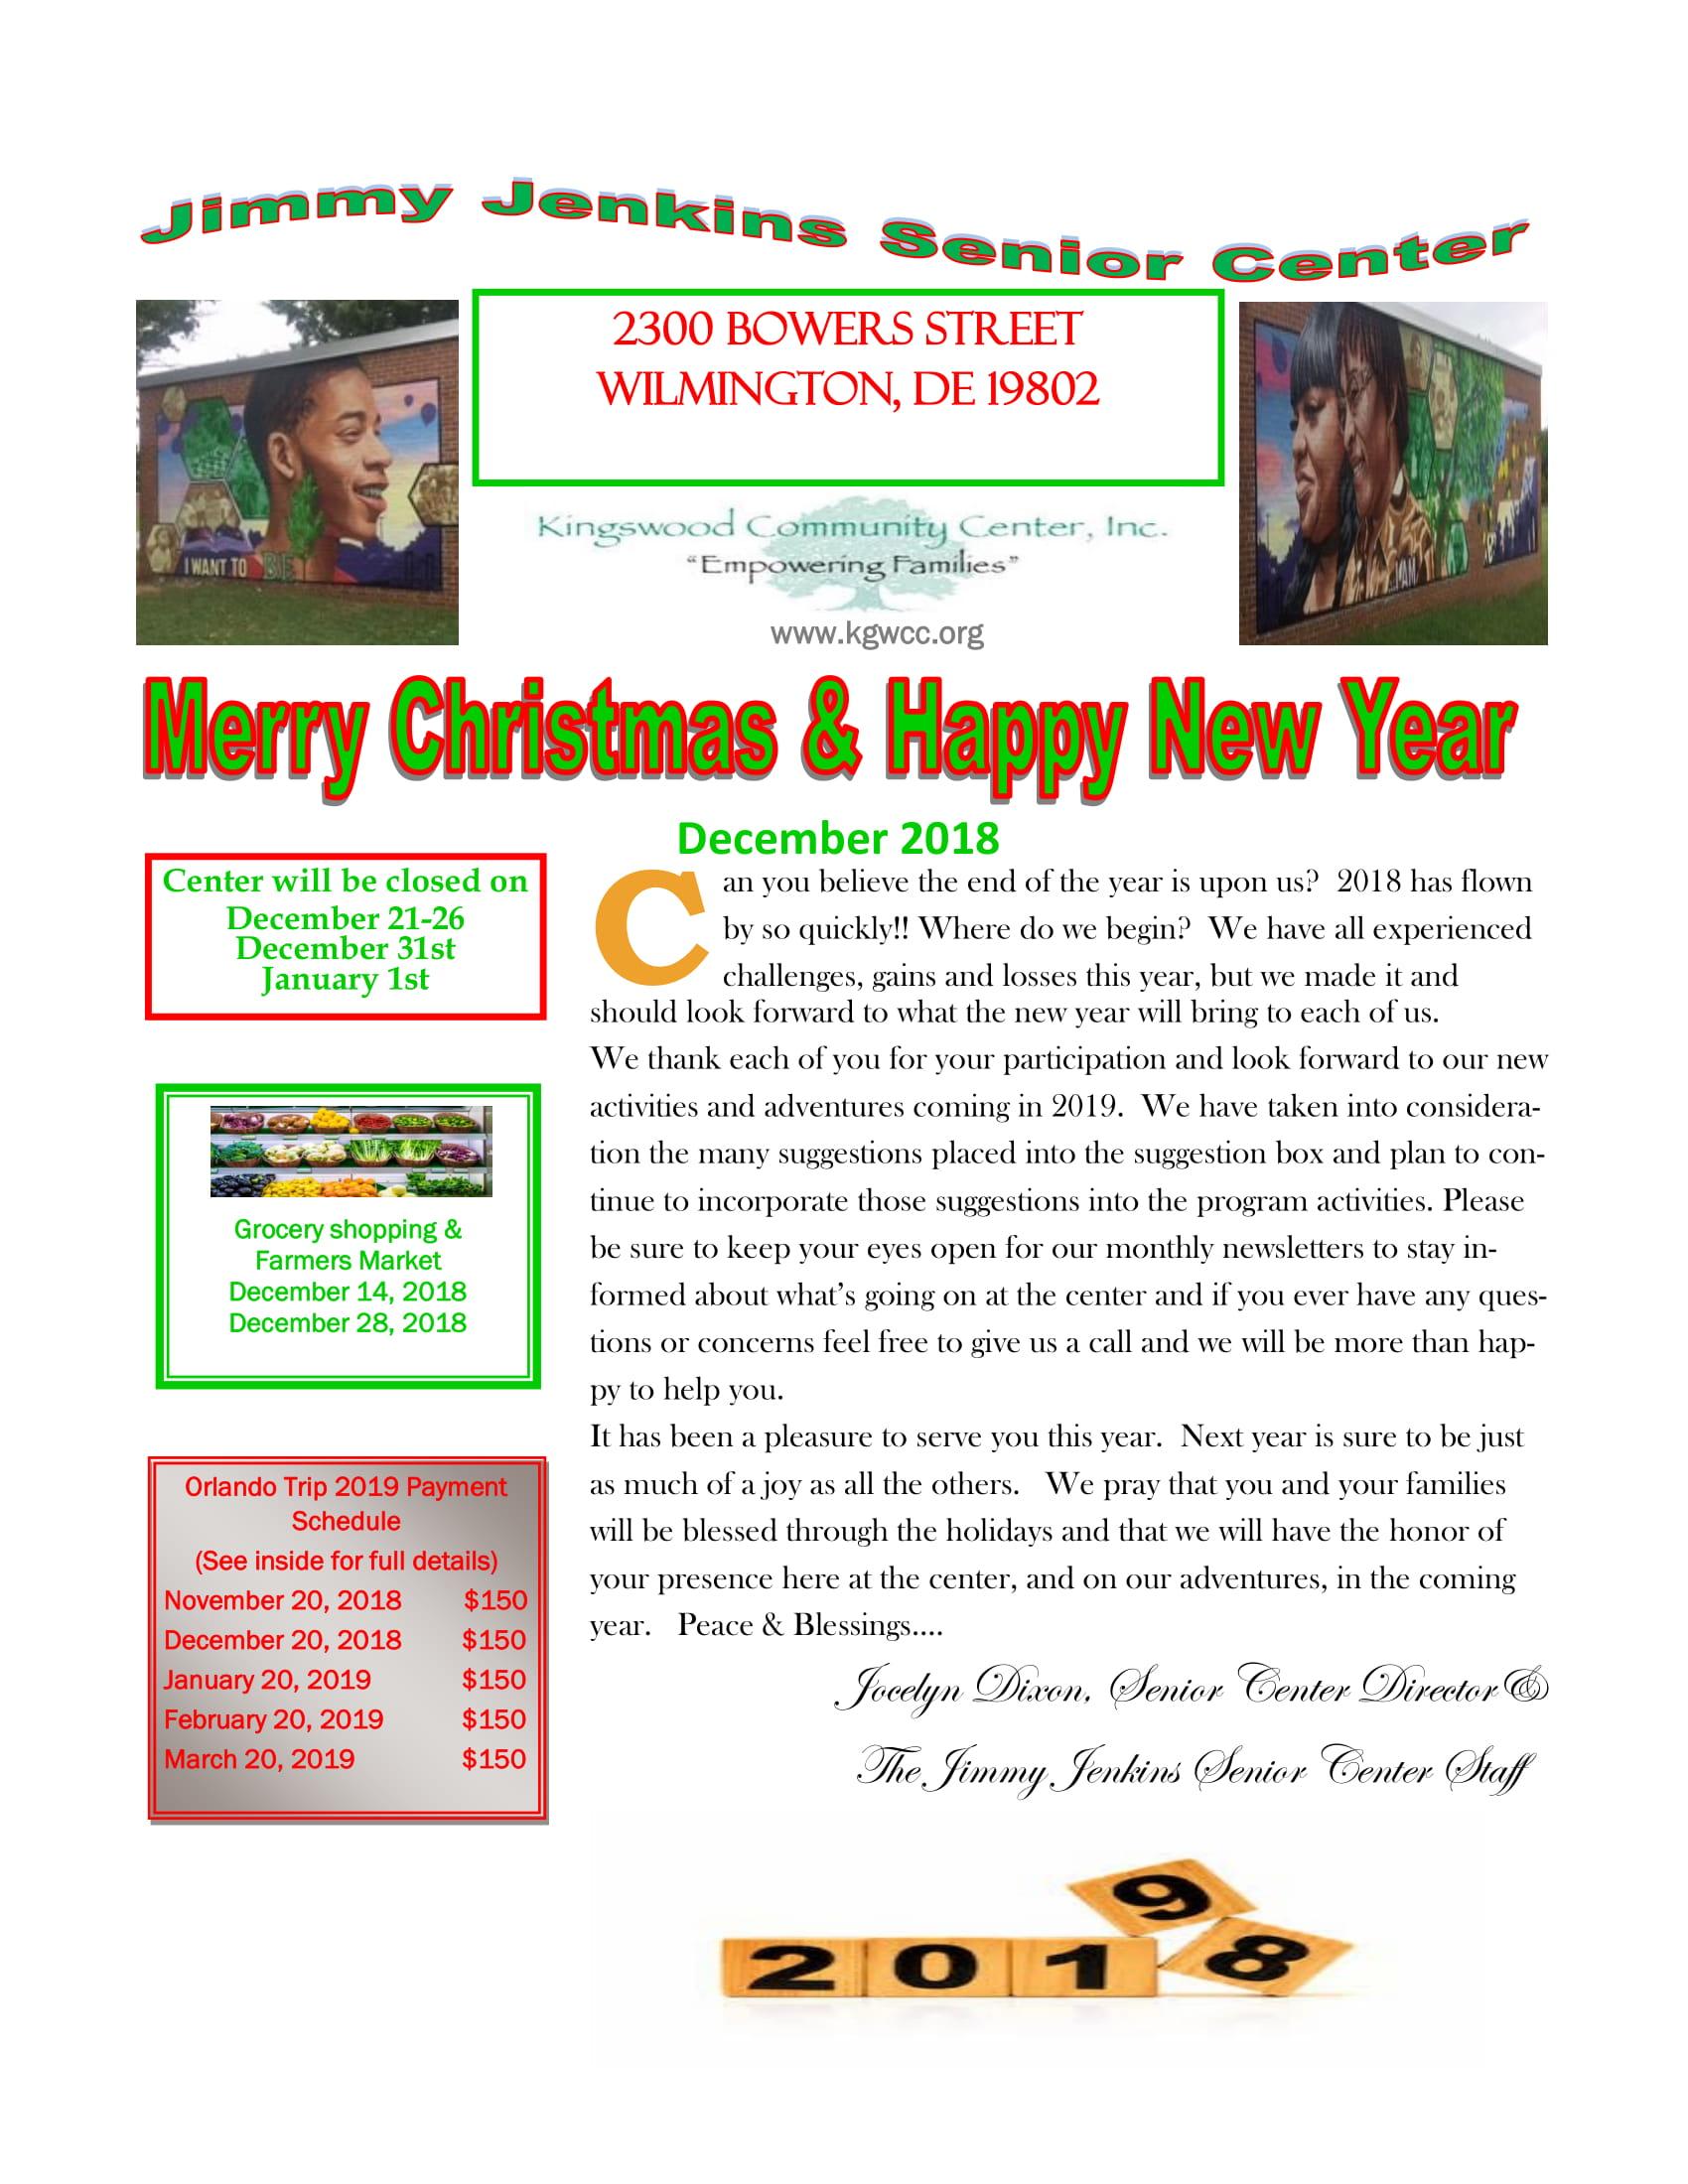 KCC December Newsletter 2018 updated 12.10.18_Part1-1.jpg